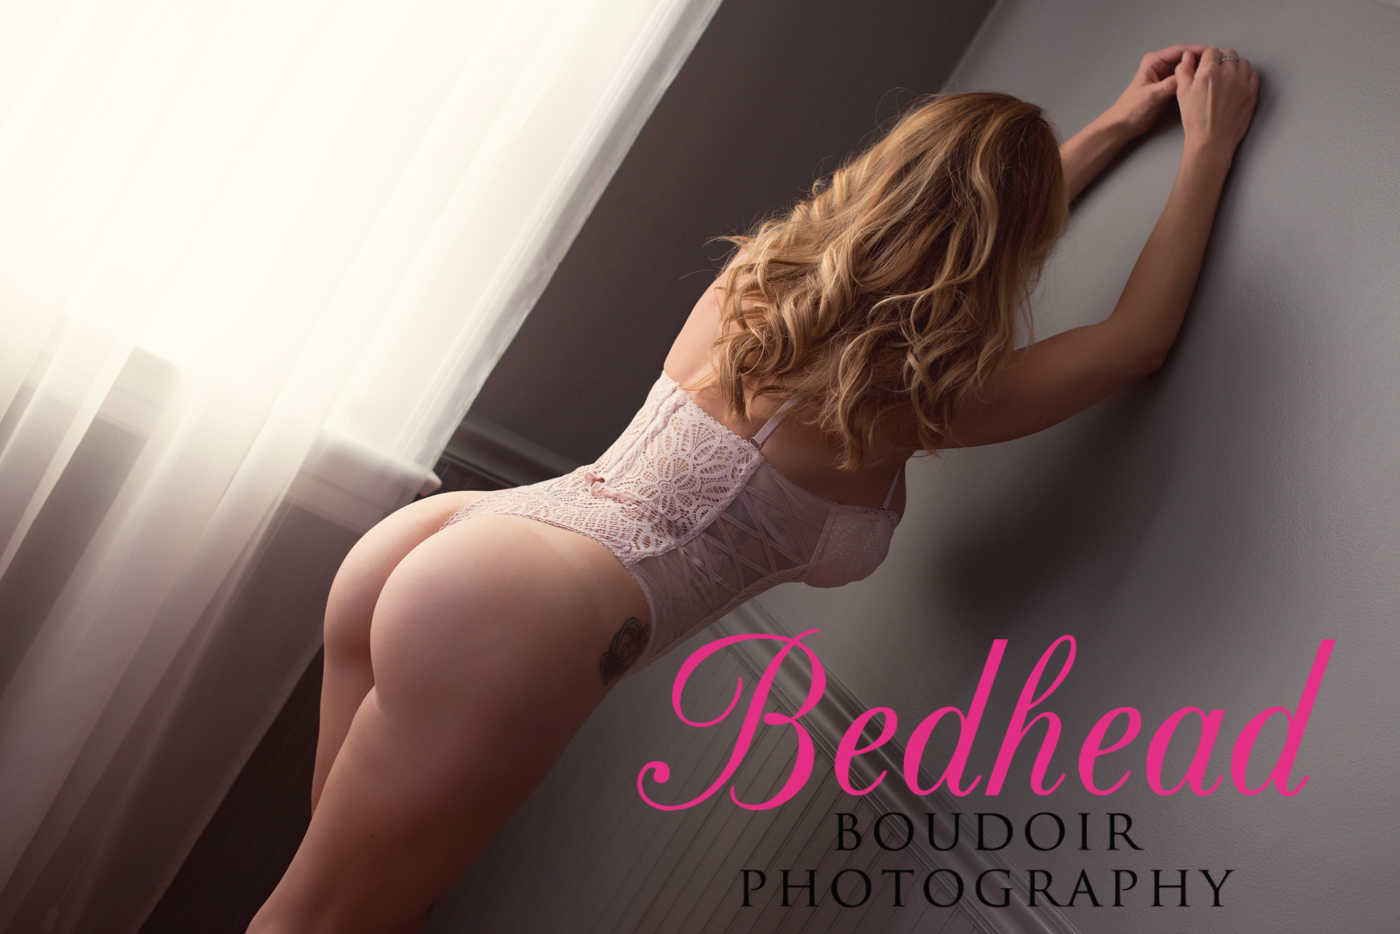 Bedhead_Boudoir_Photography_Chicago-24.jpg